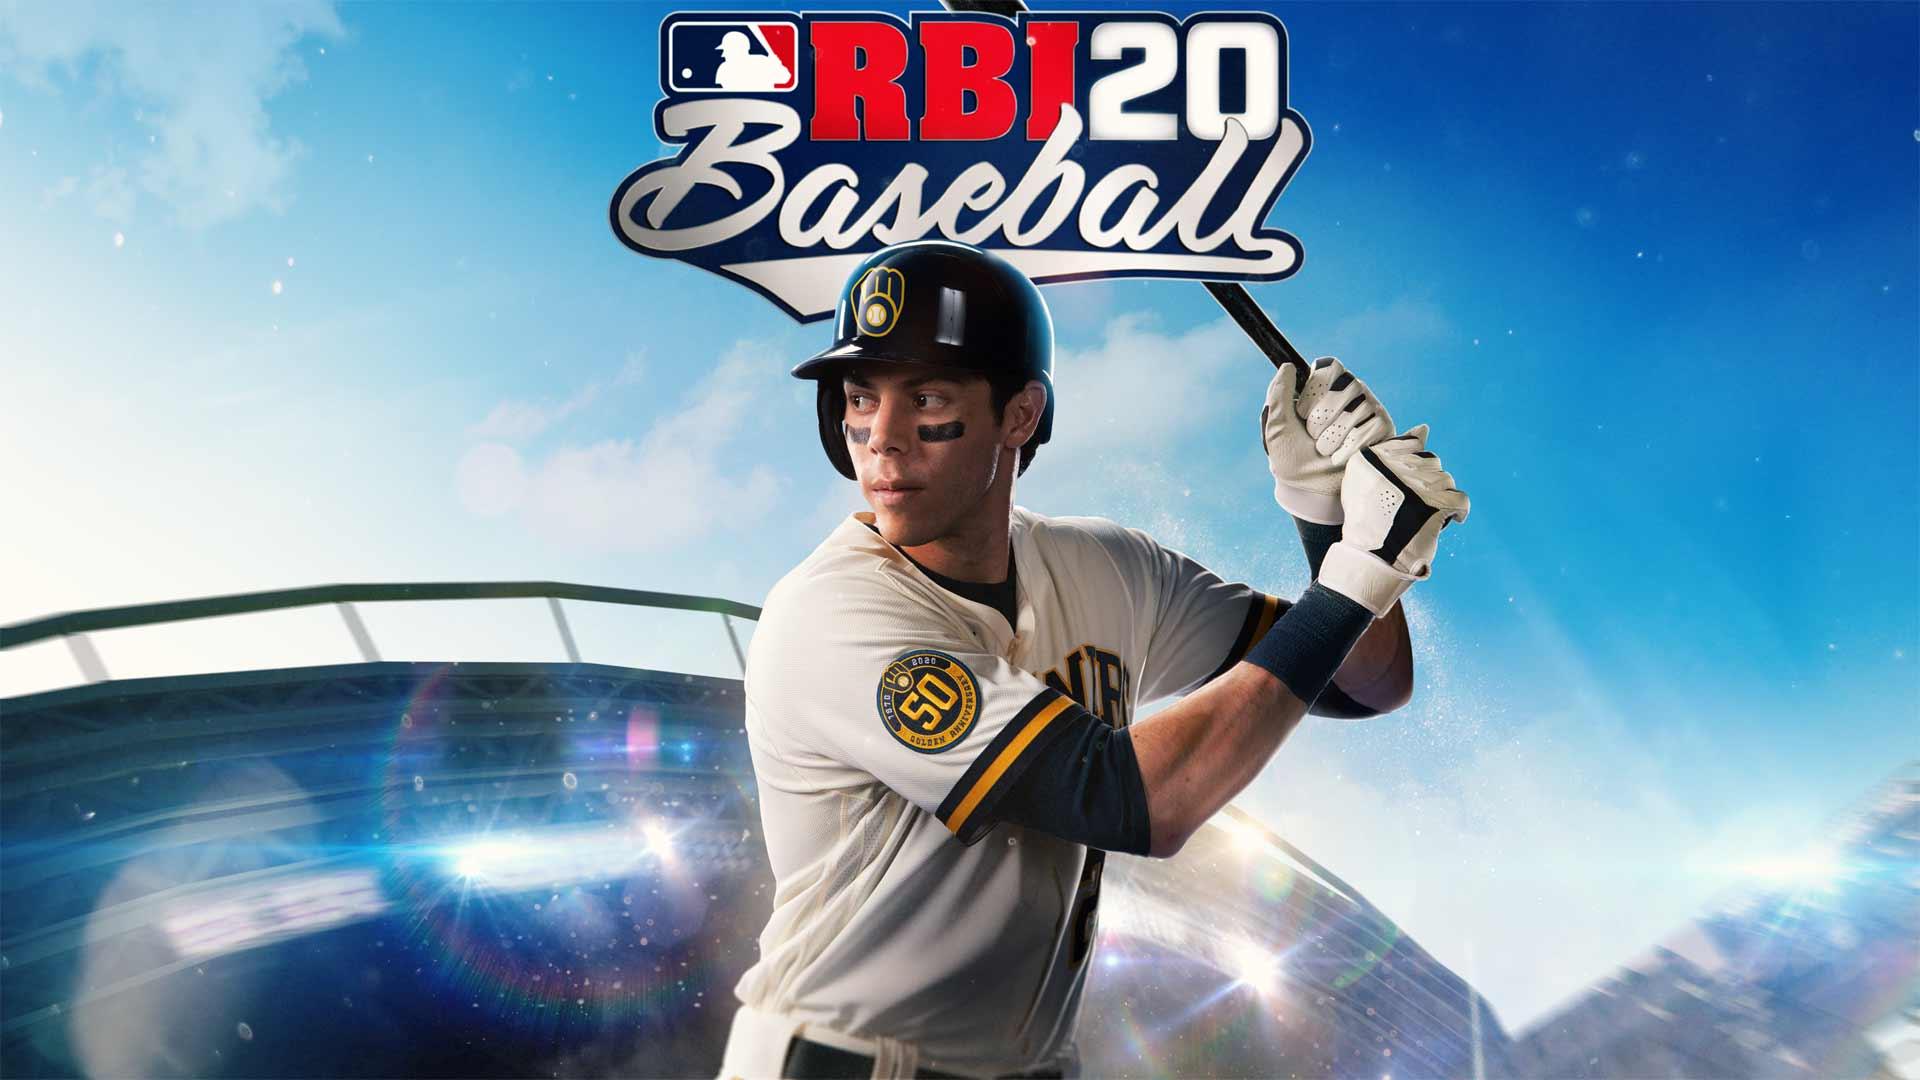 RBI Baseball 20 File Size